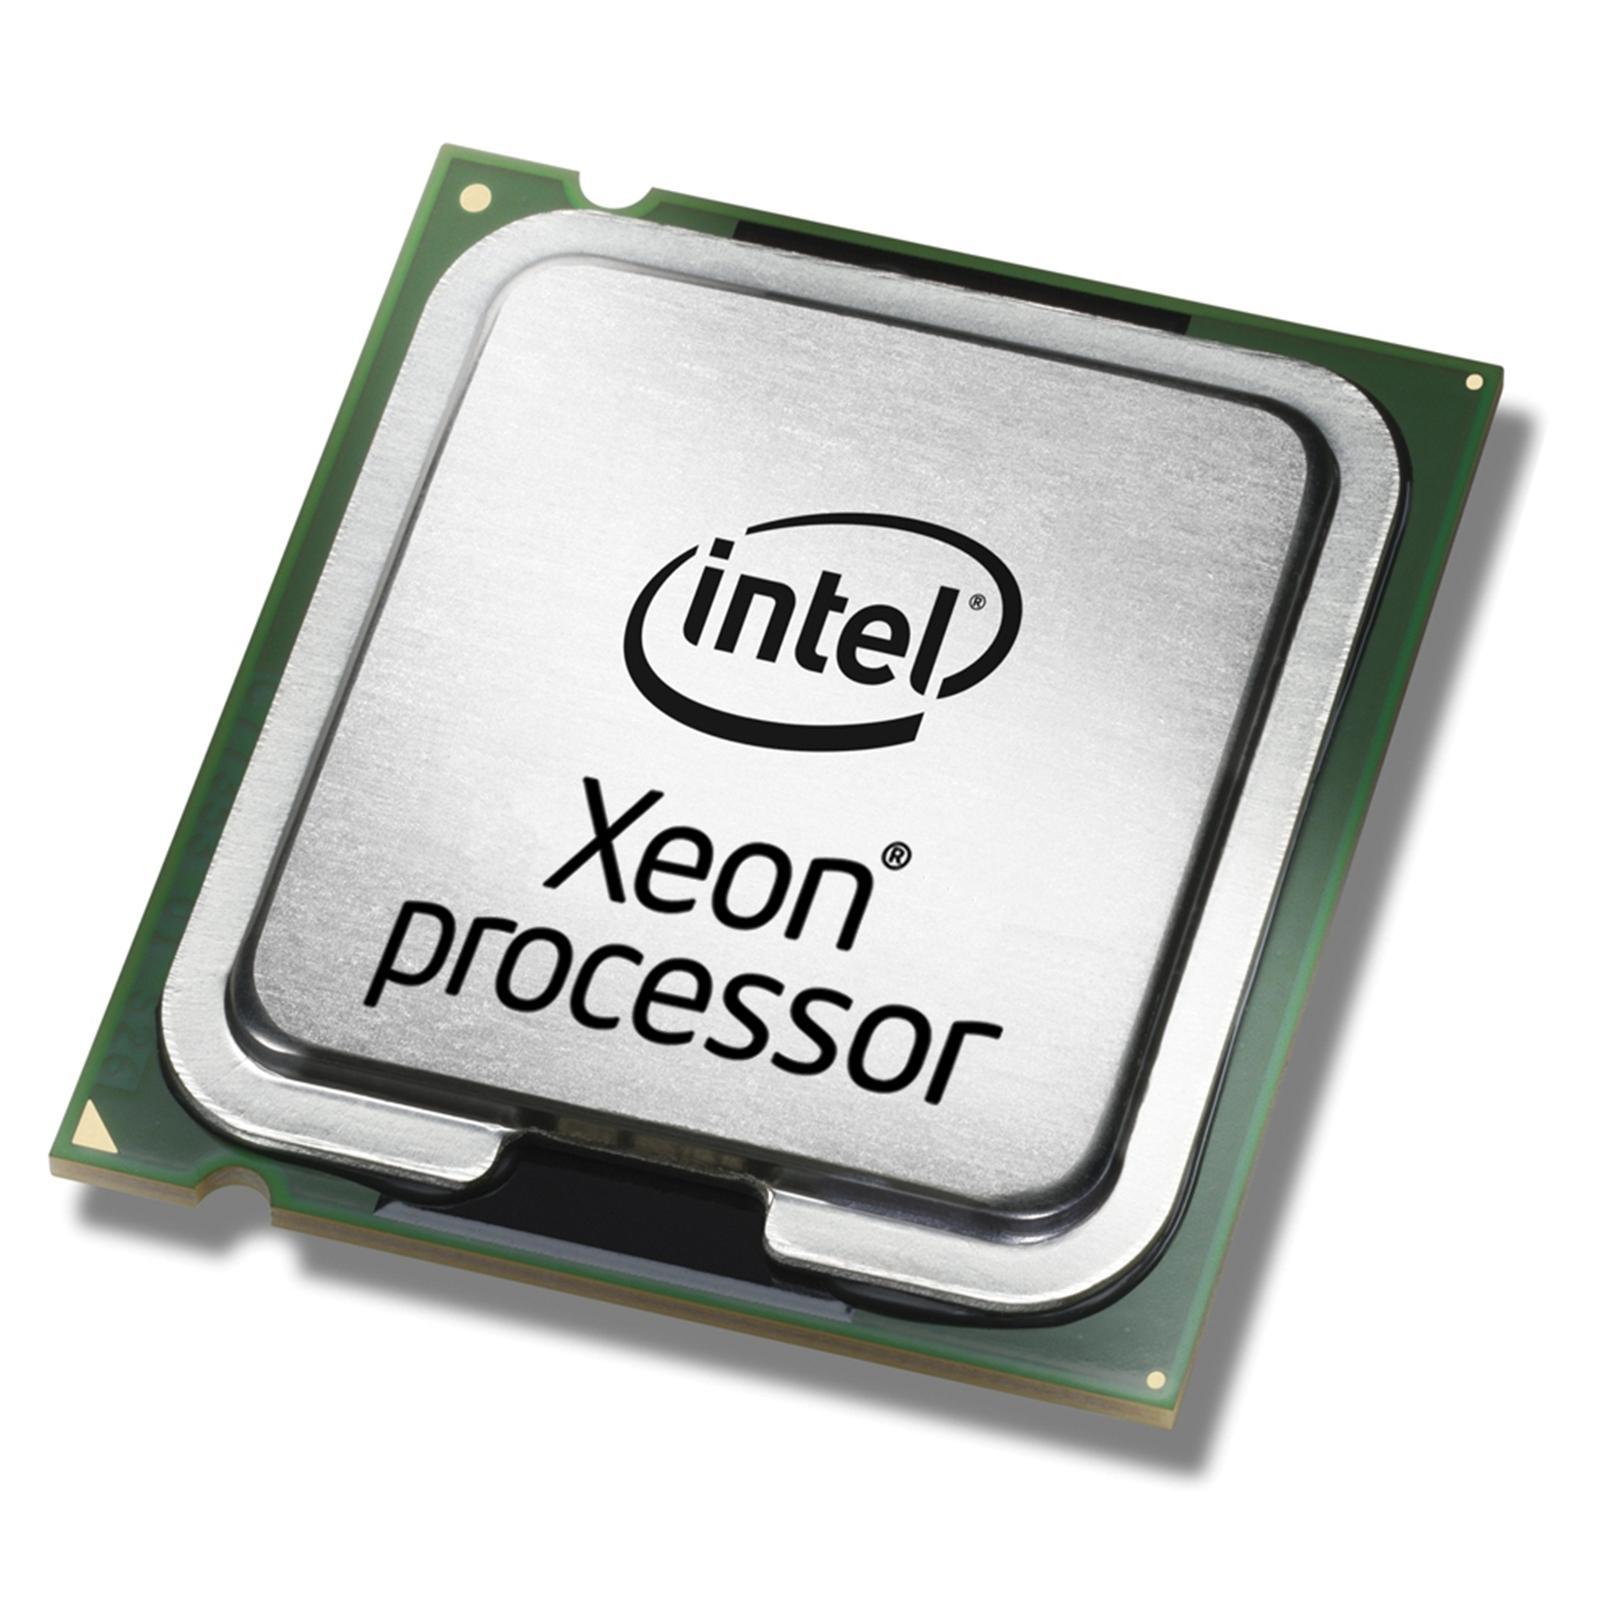 System x Xeon Processor E5-2620 6C 2.1GHz